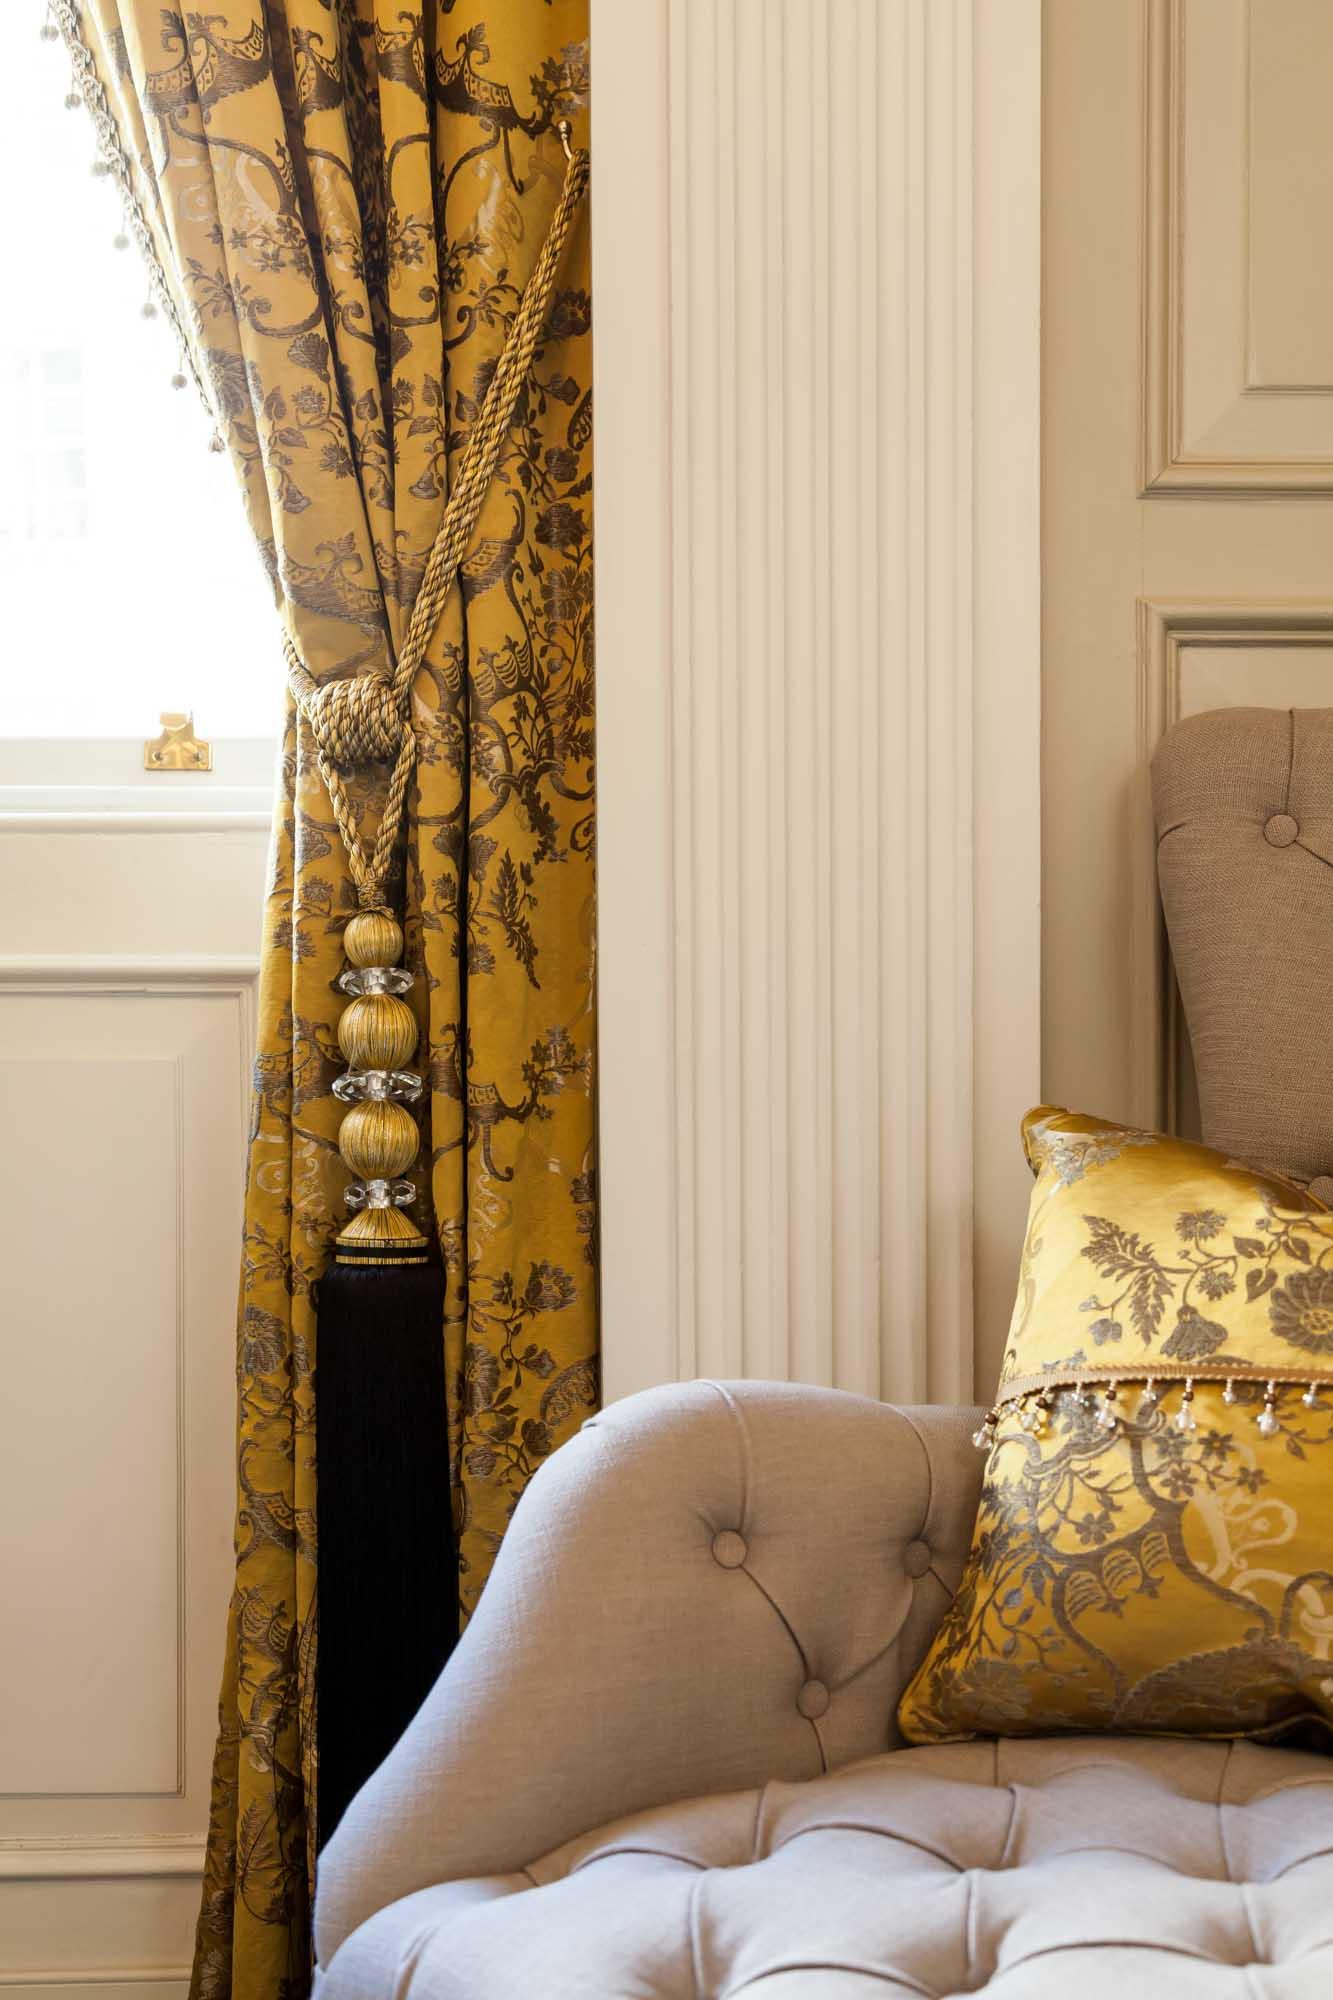 jonathan bond photography, gold curtain tassel tieback, hyde park, london